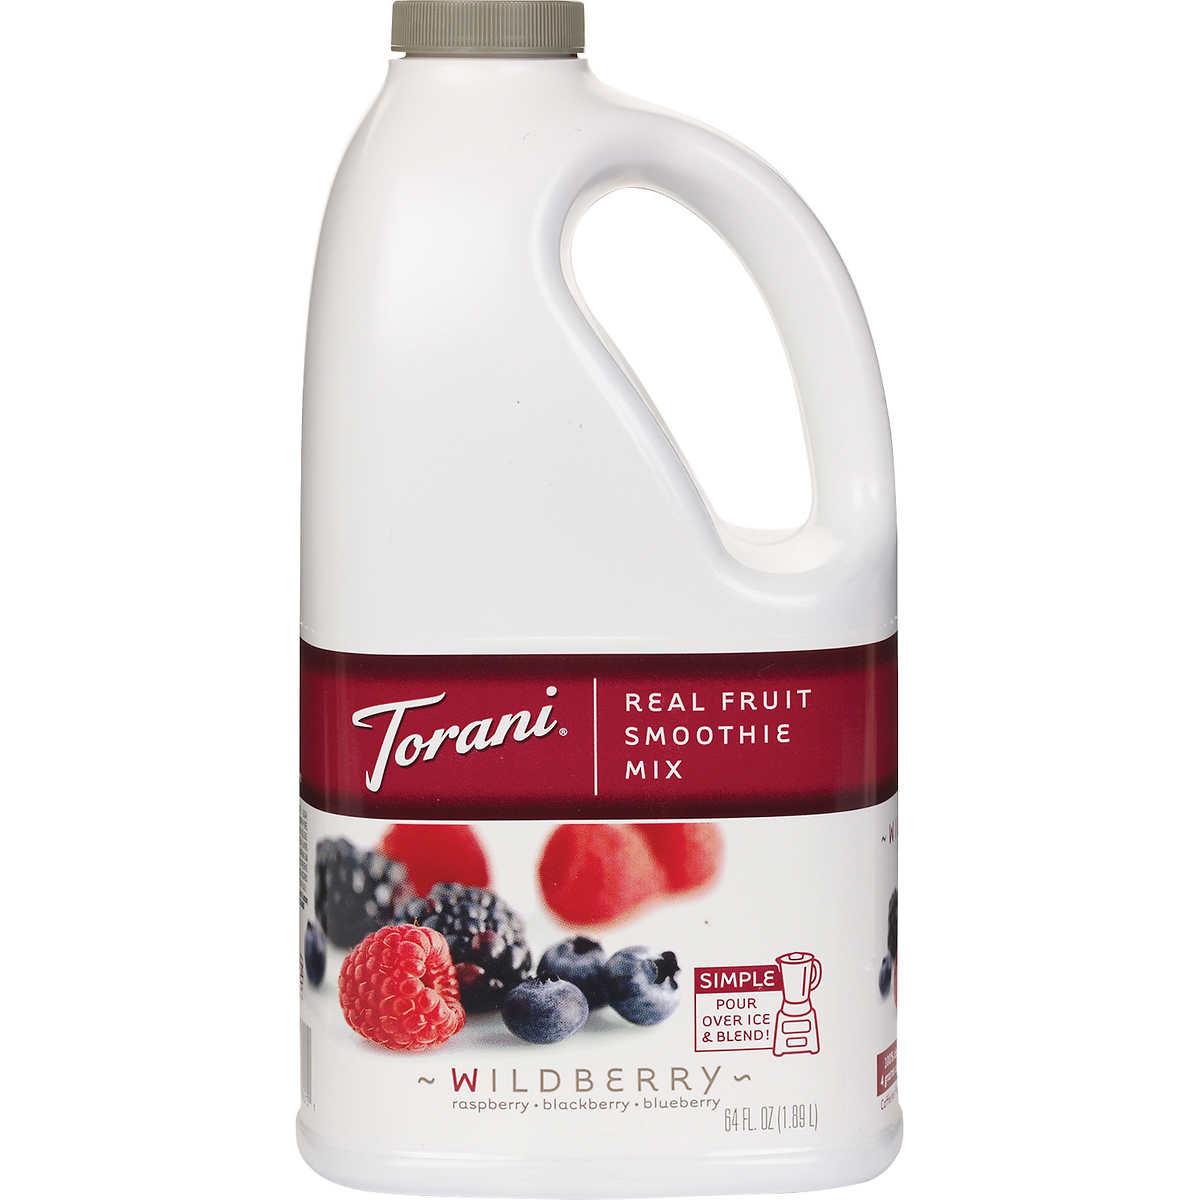 Torani Wildberry Real Fruit Smoothie Mix